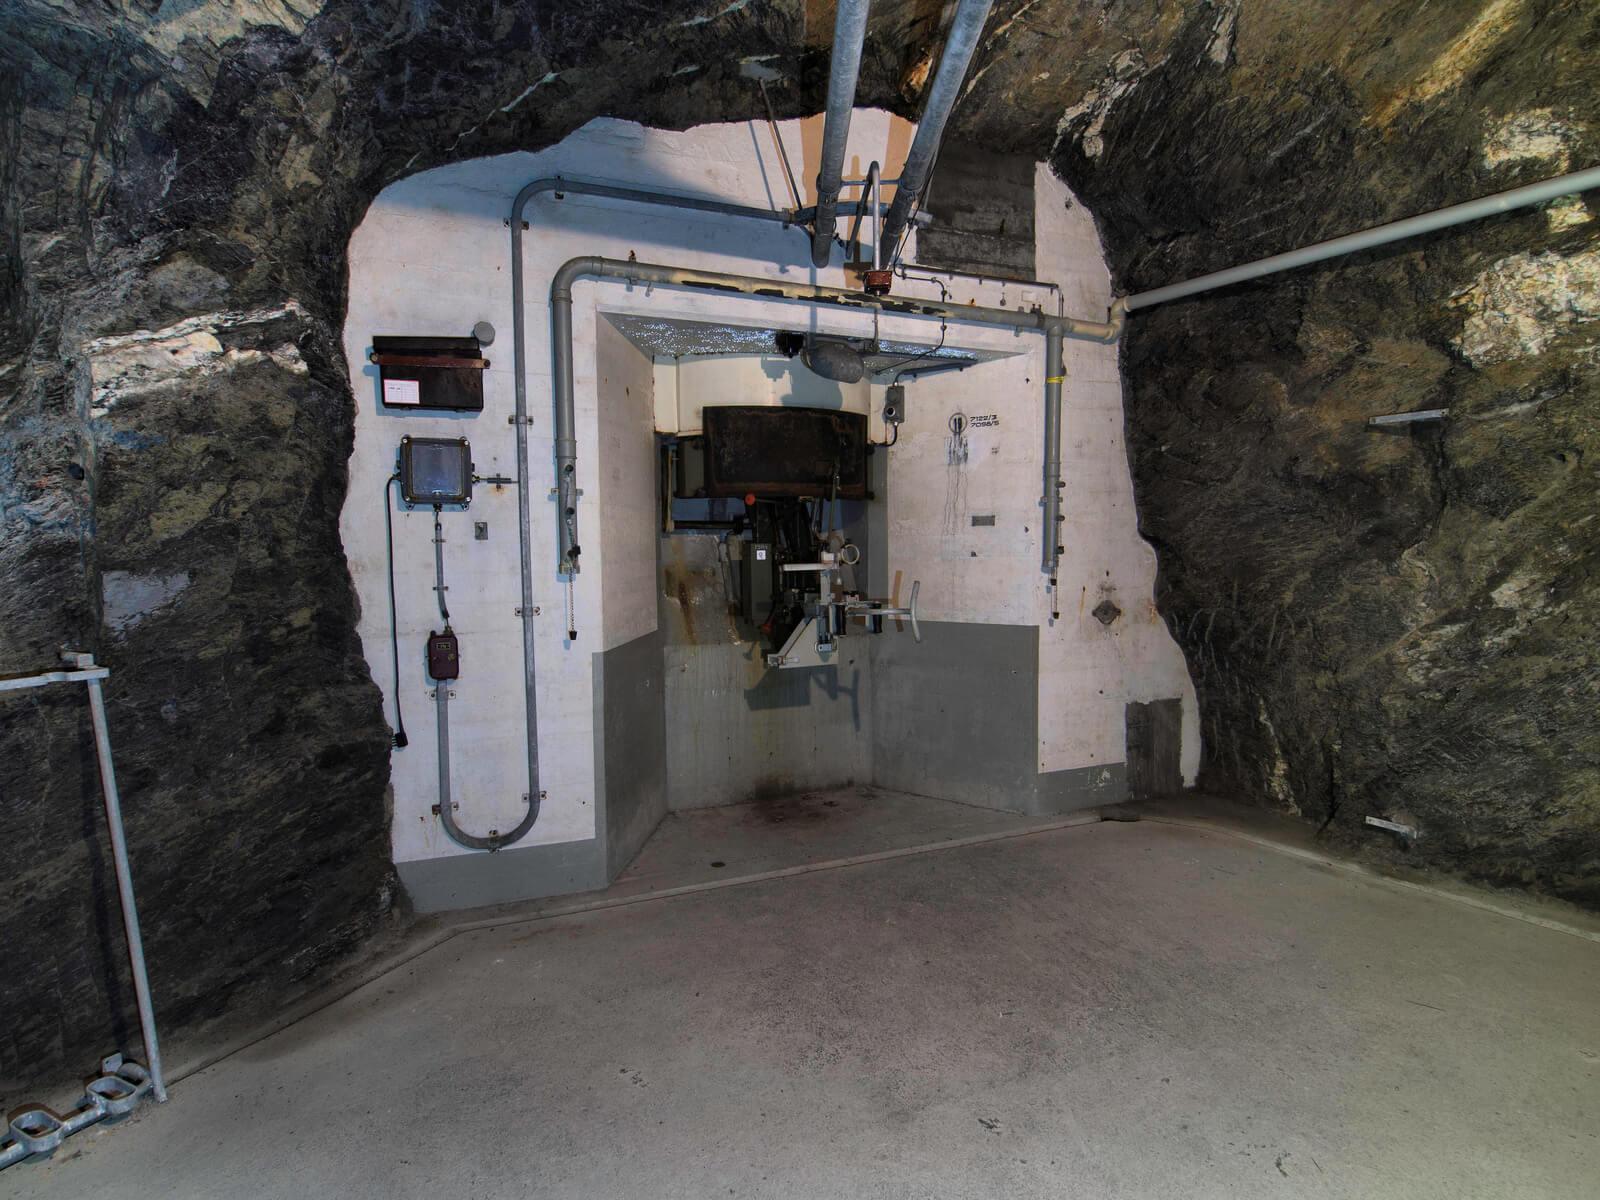 Festung Schollberg